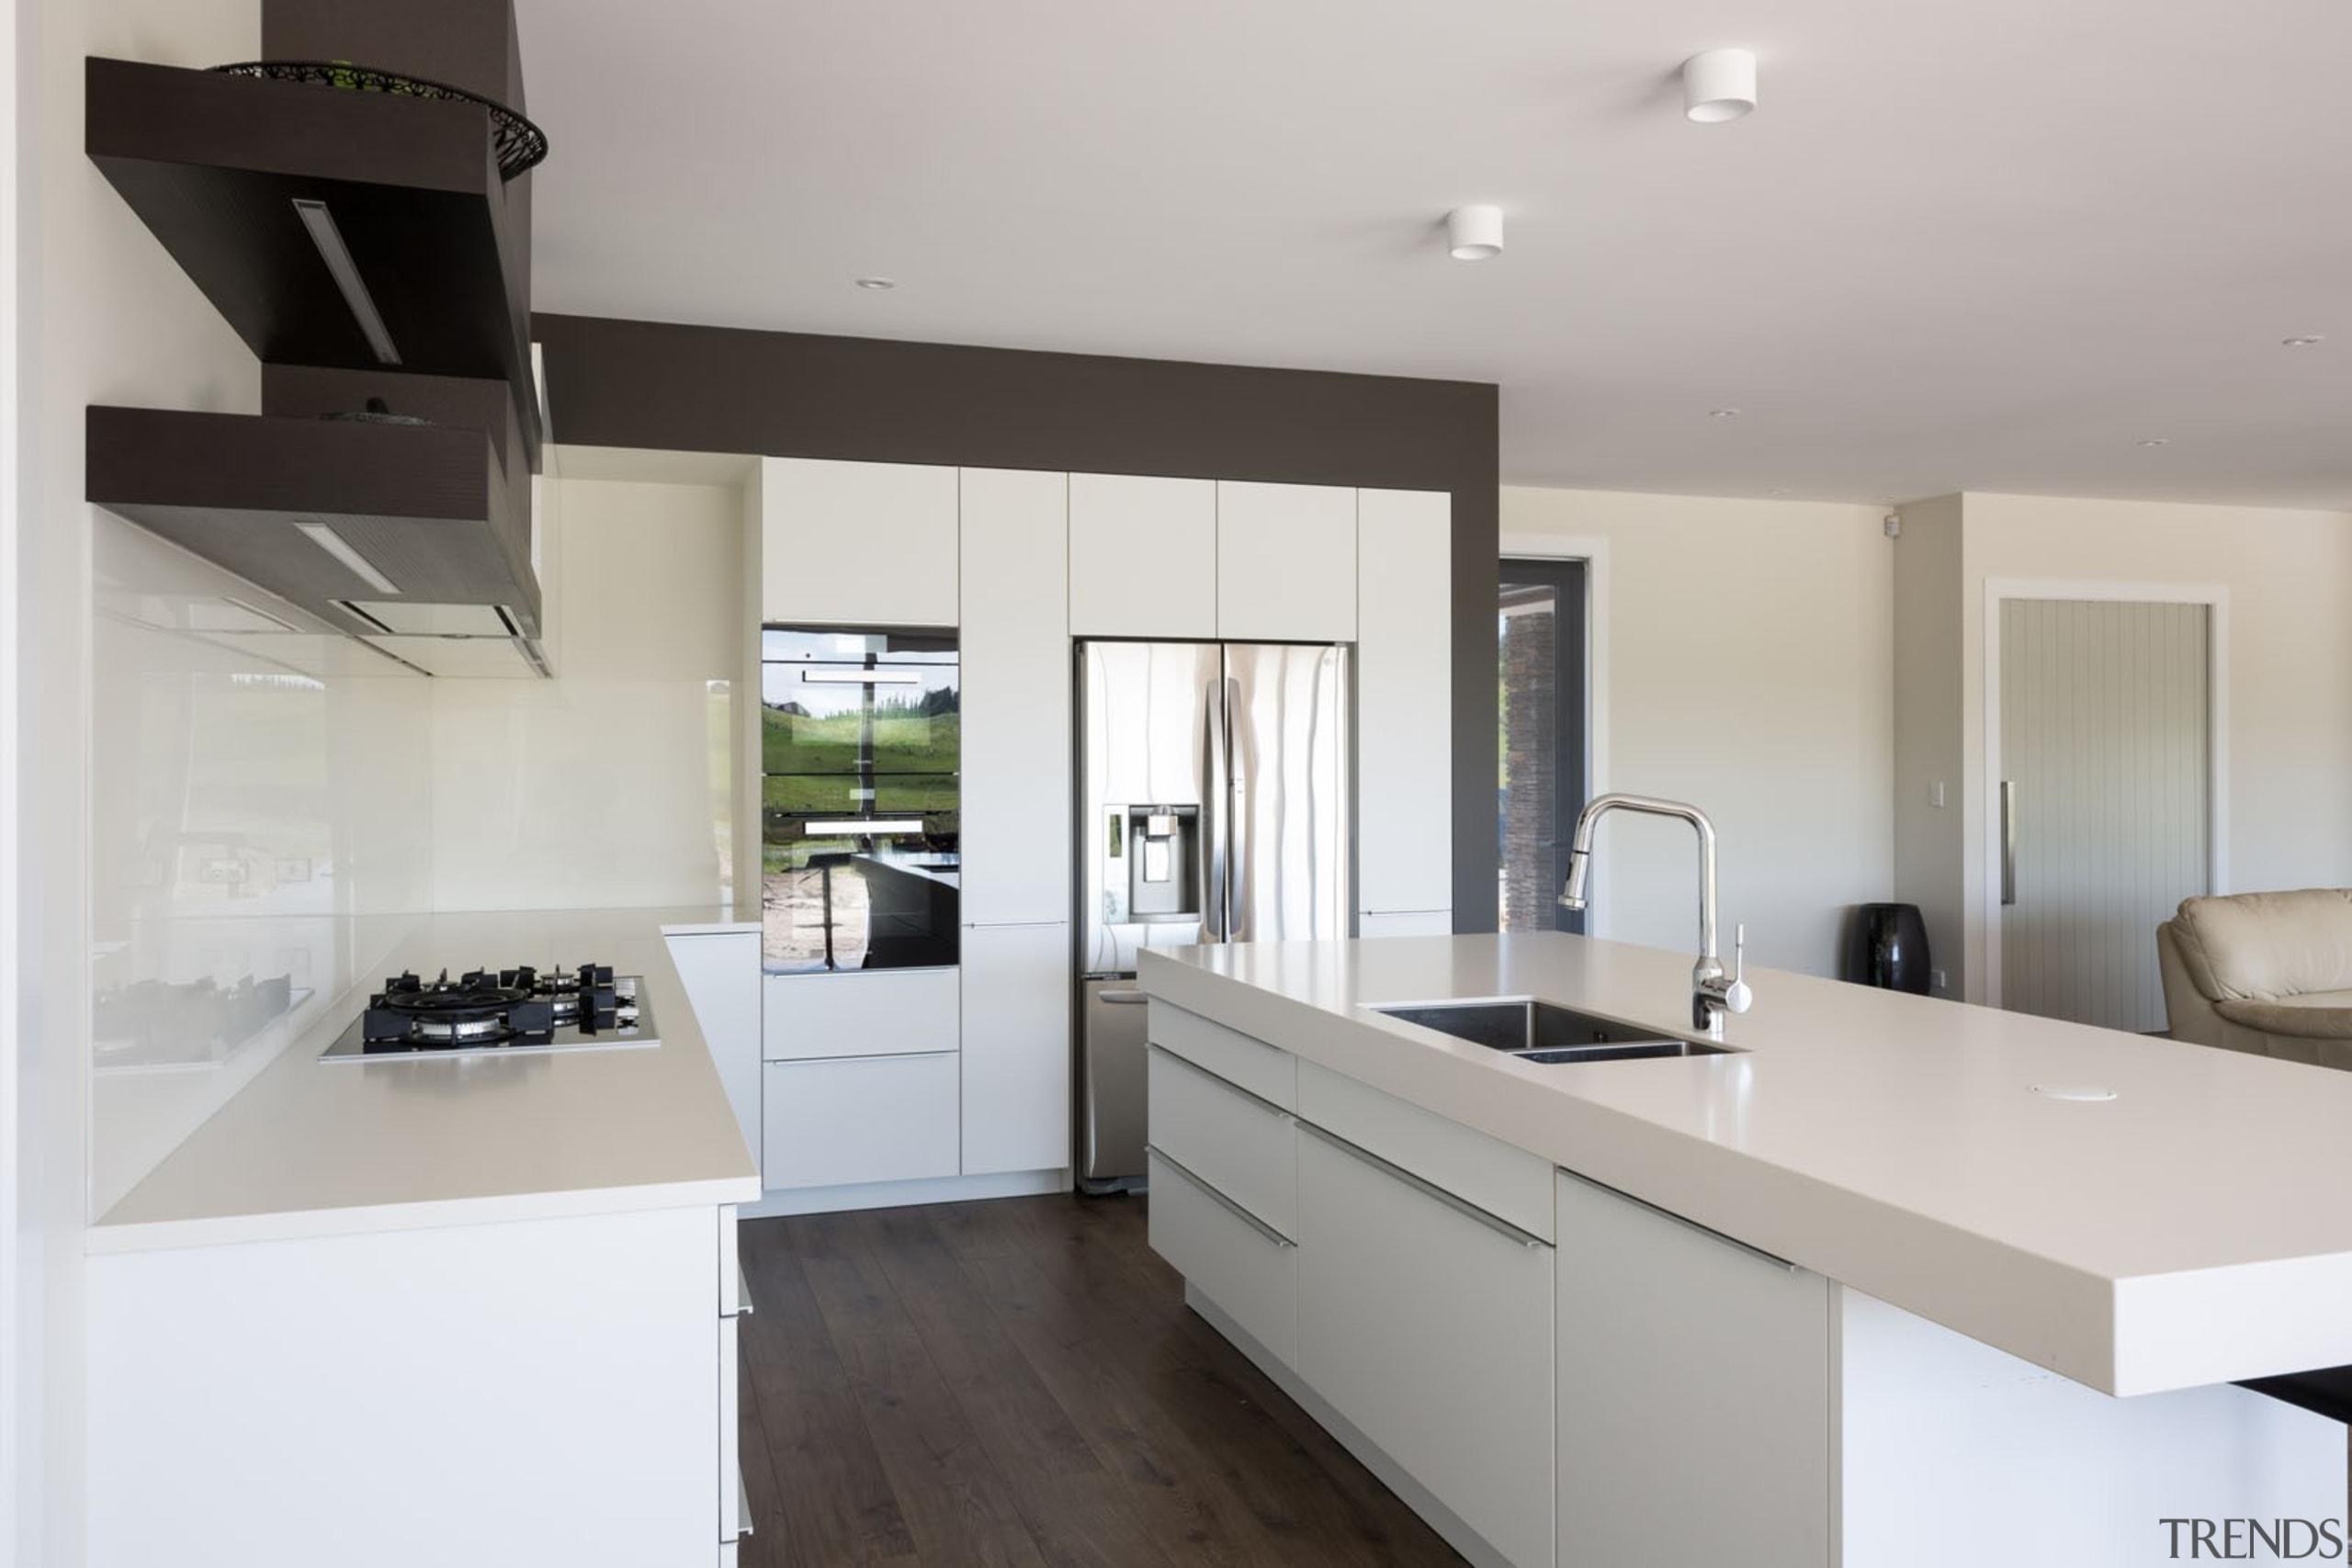 IMGL9862-11 - Dairy Flat Kitchen - countertop | countertop, cuisine classique, interior design, kitchen, real estate, room, gray